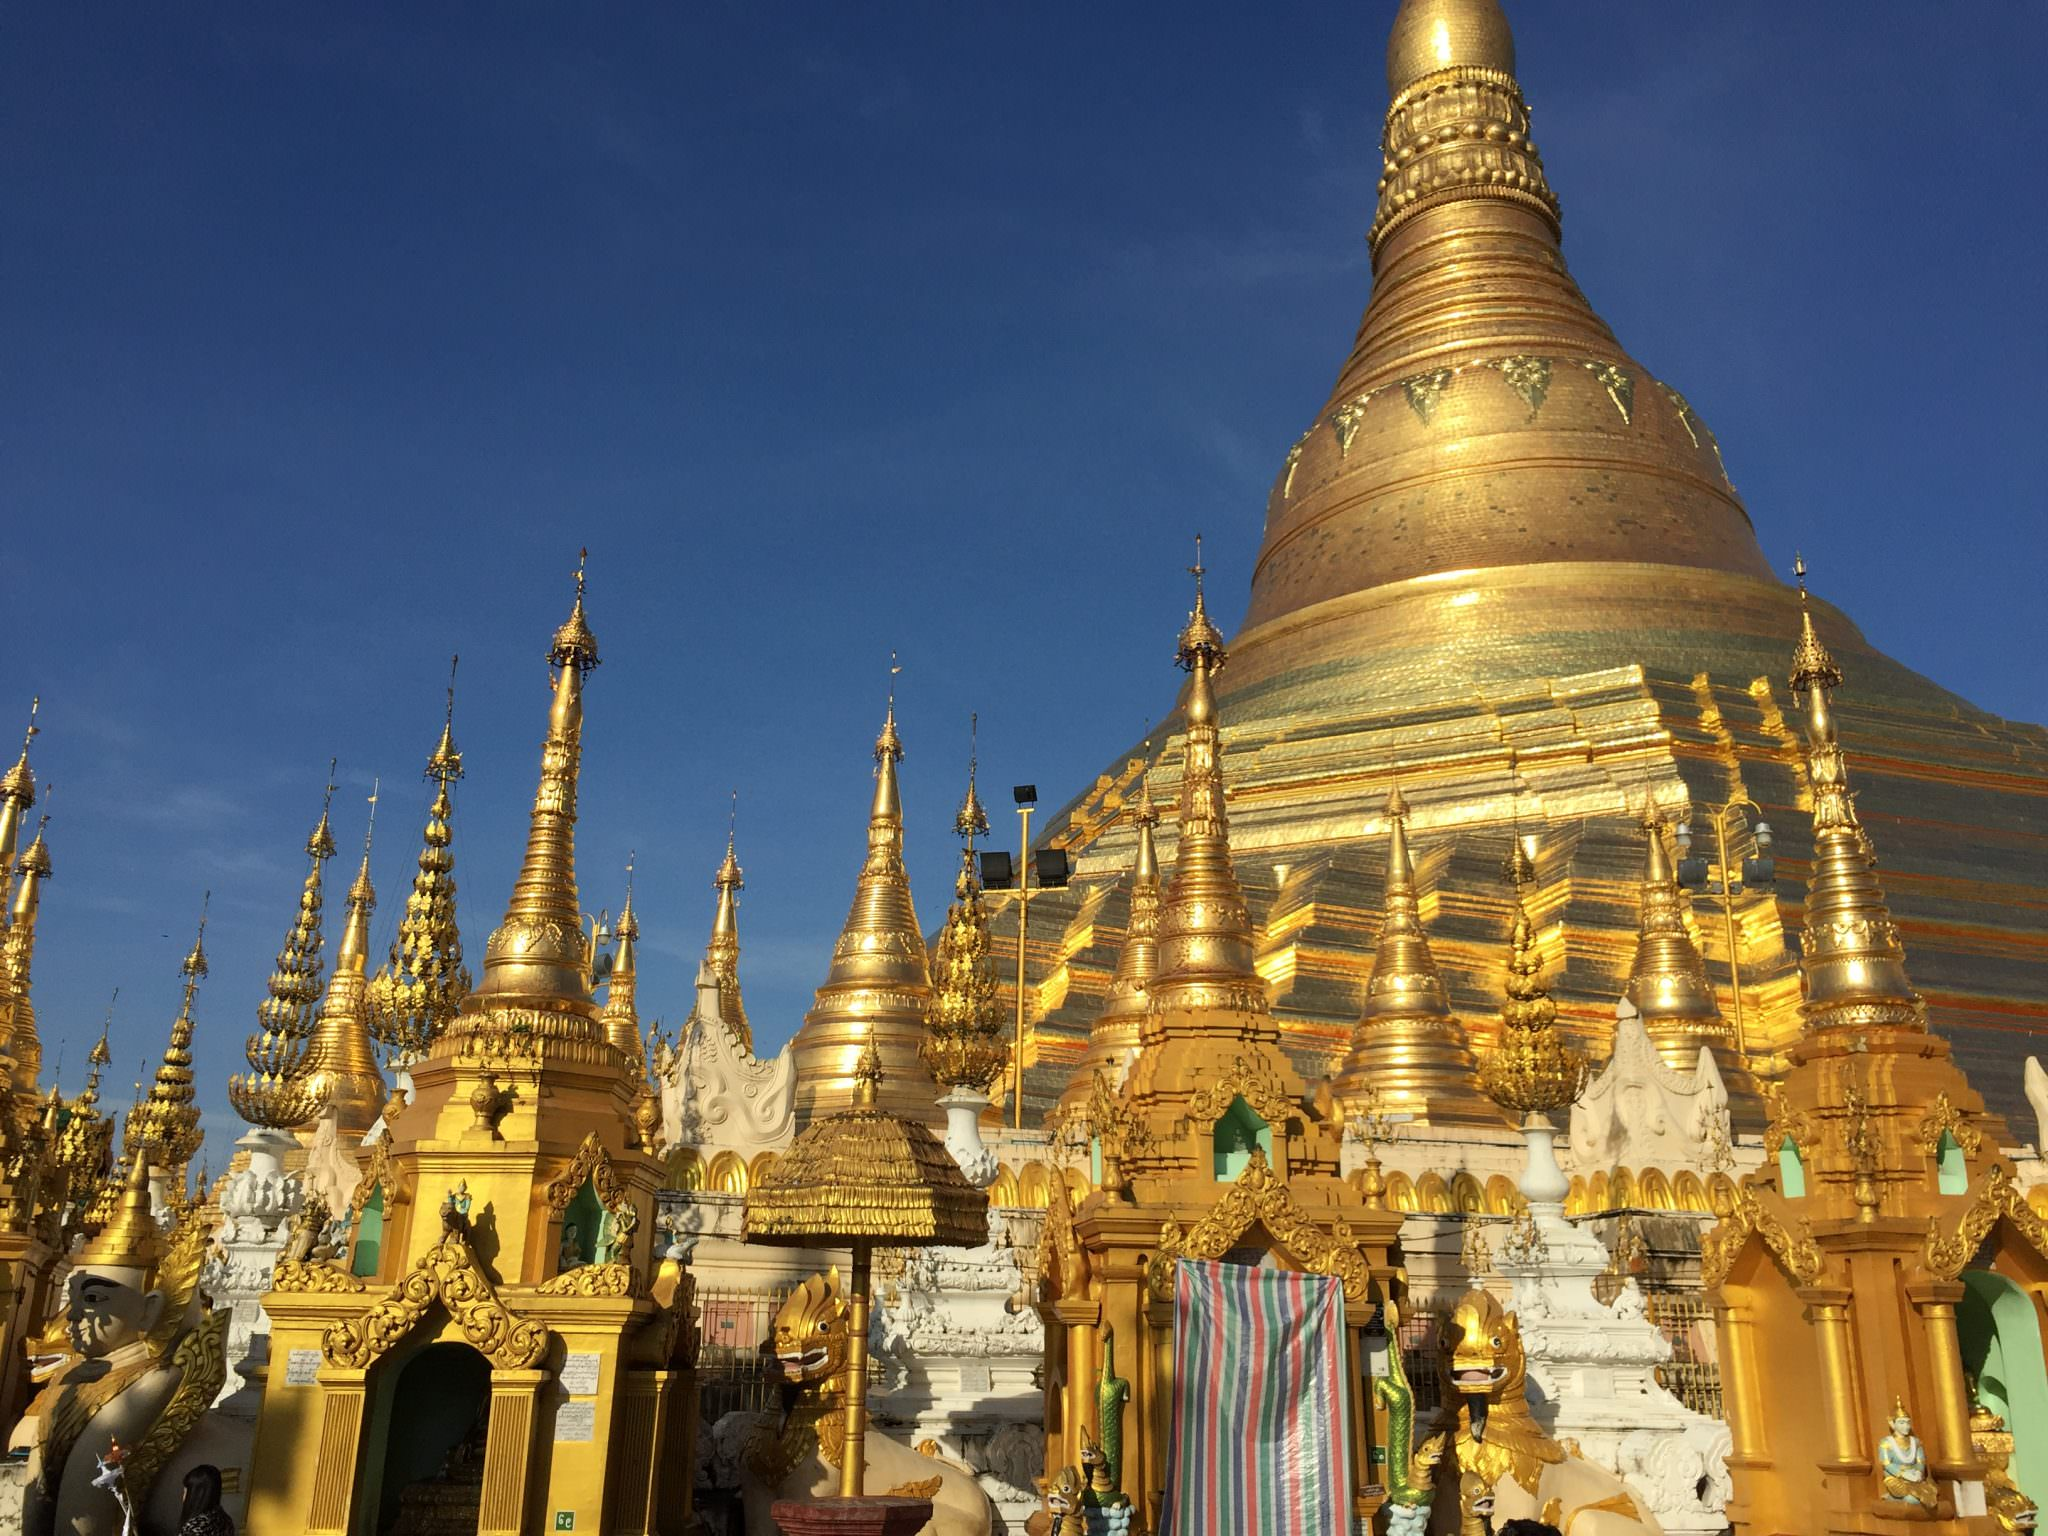 Shwedagon Pagoda, Yangon, Myanmar. © 2015 Gail Jessen